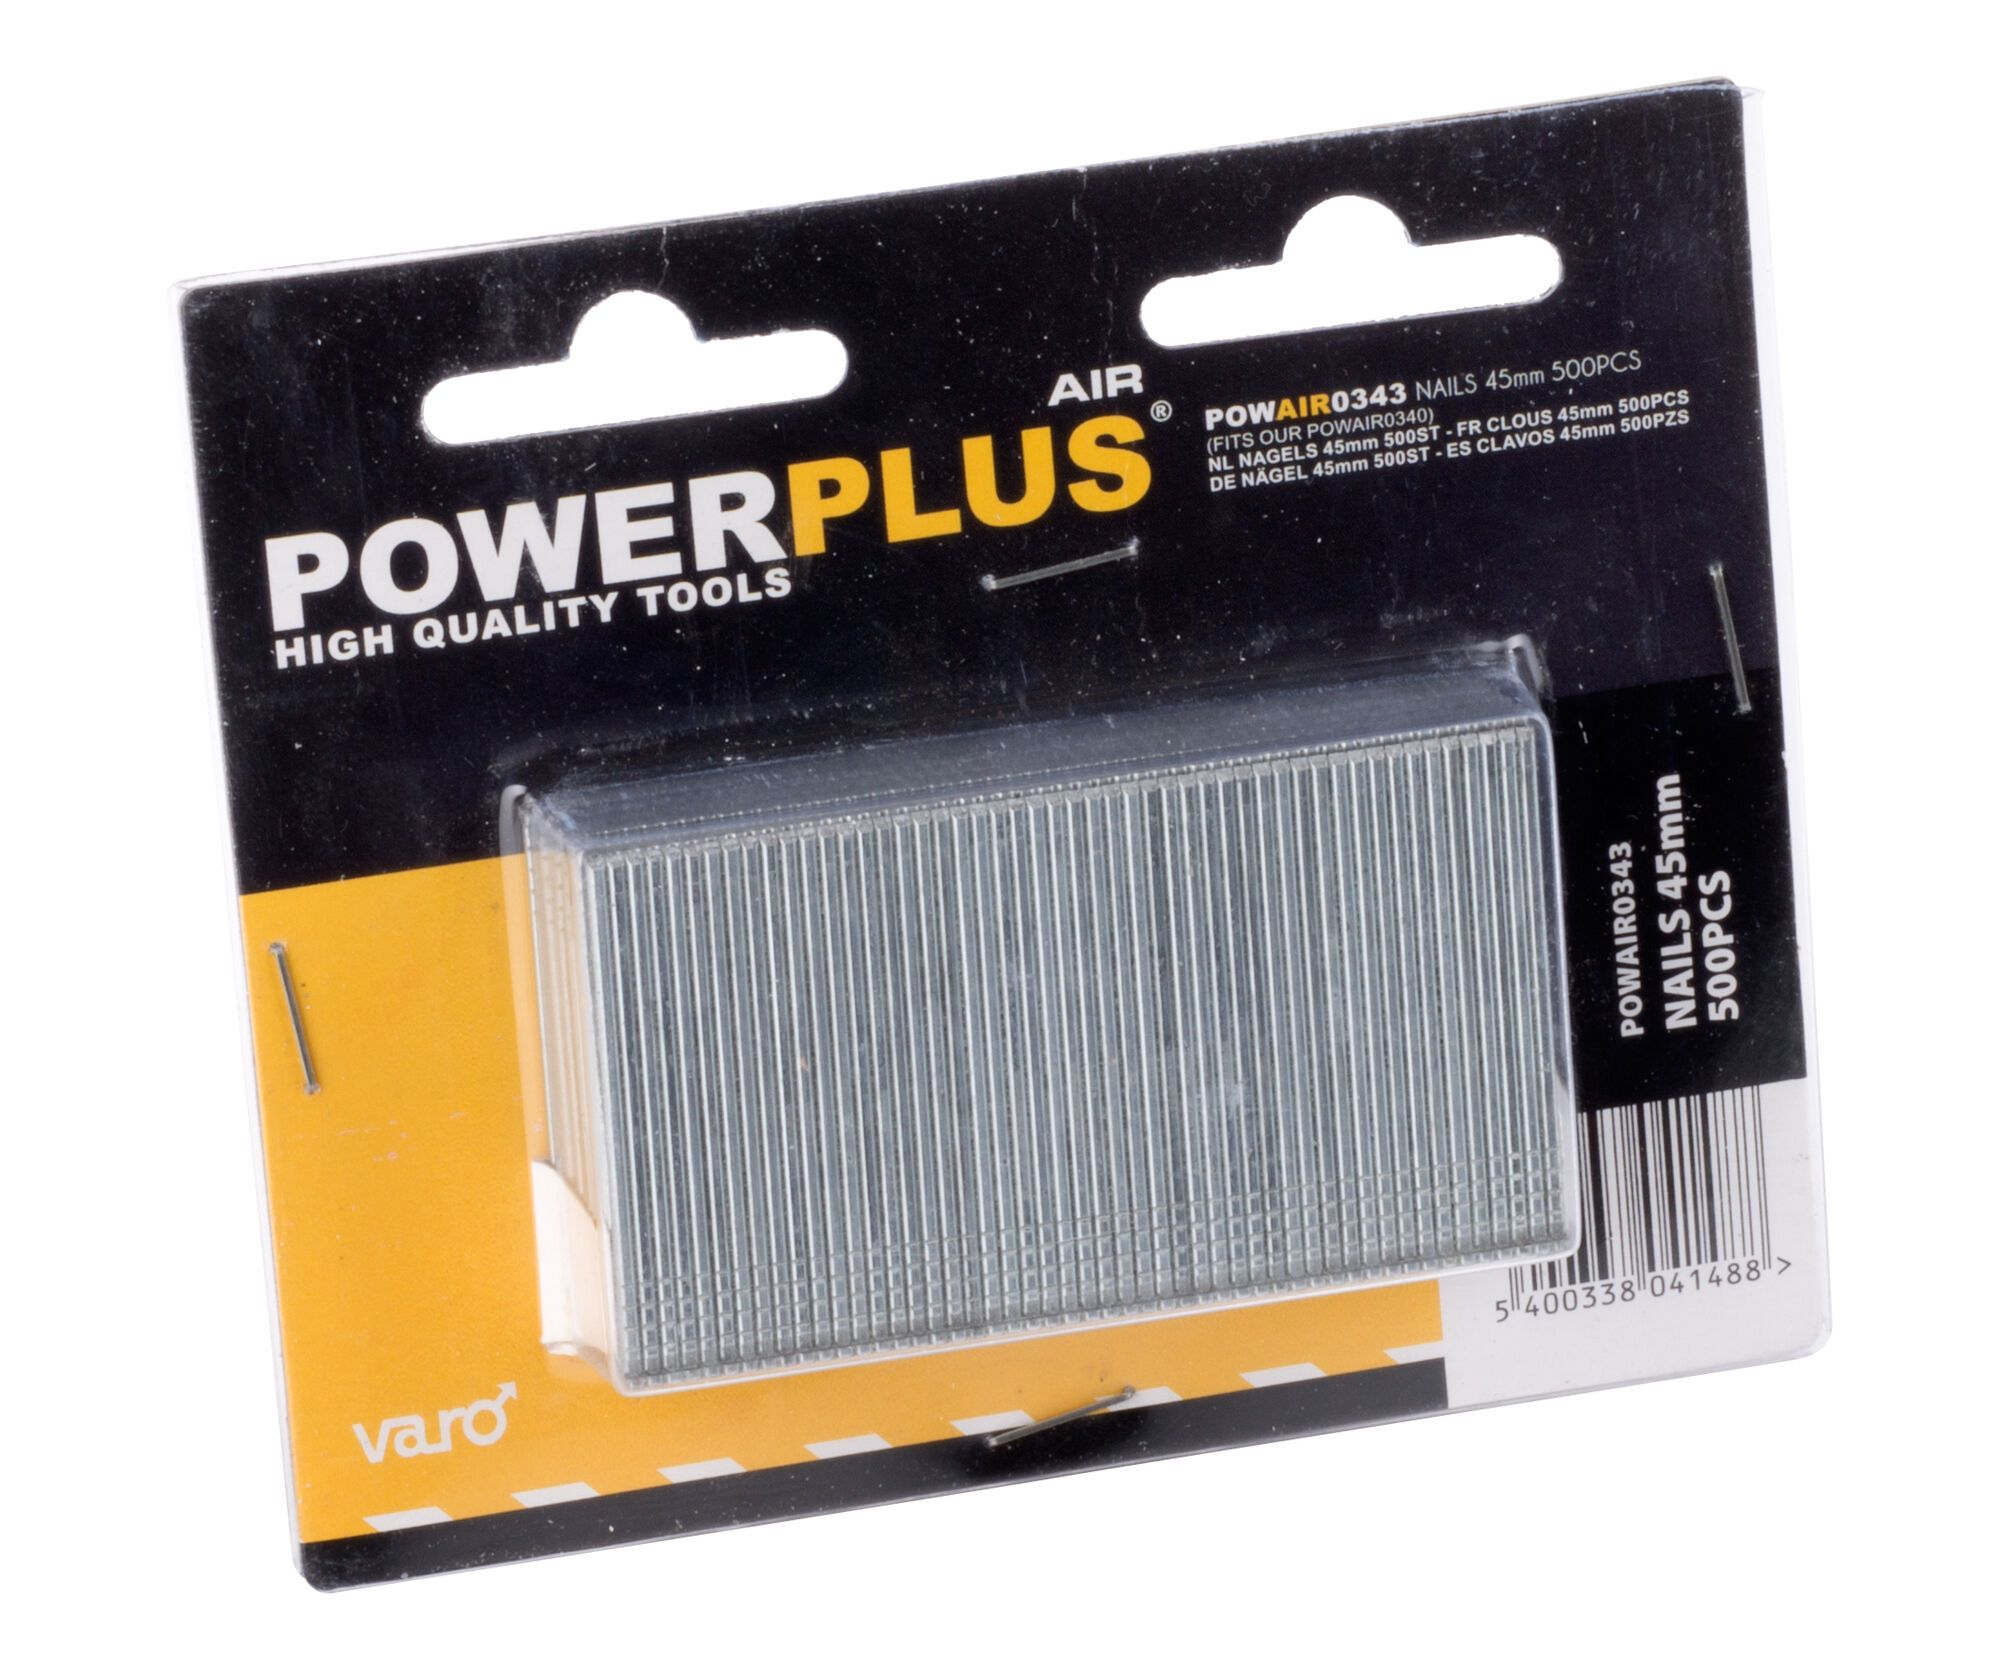 Powerplus POWAIR0343 500 Spijkers 45 mm | Stalen nagels voor nagelapparaat